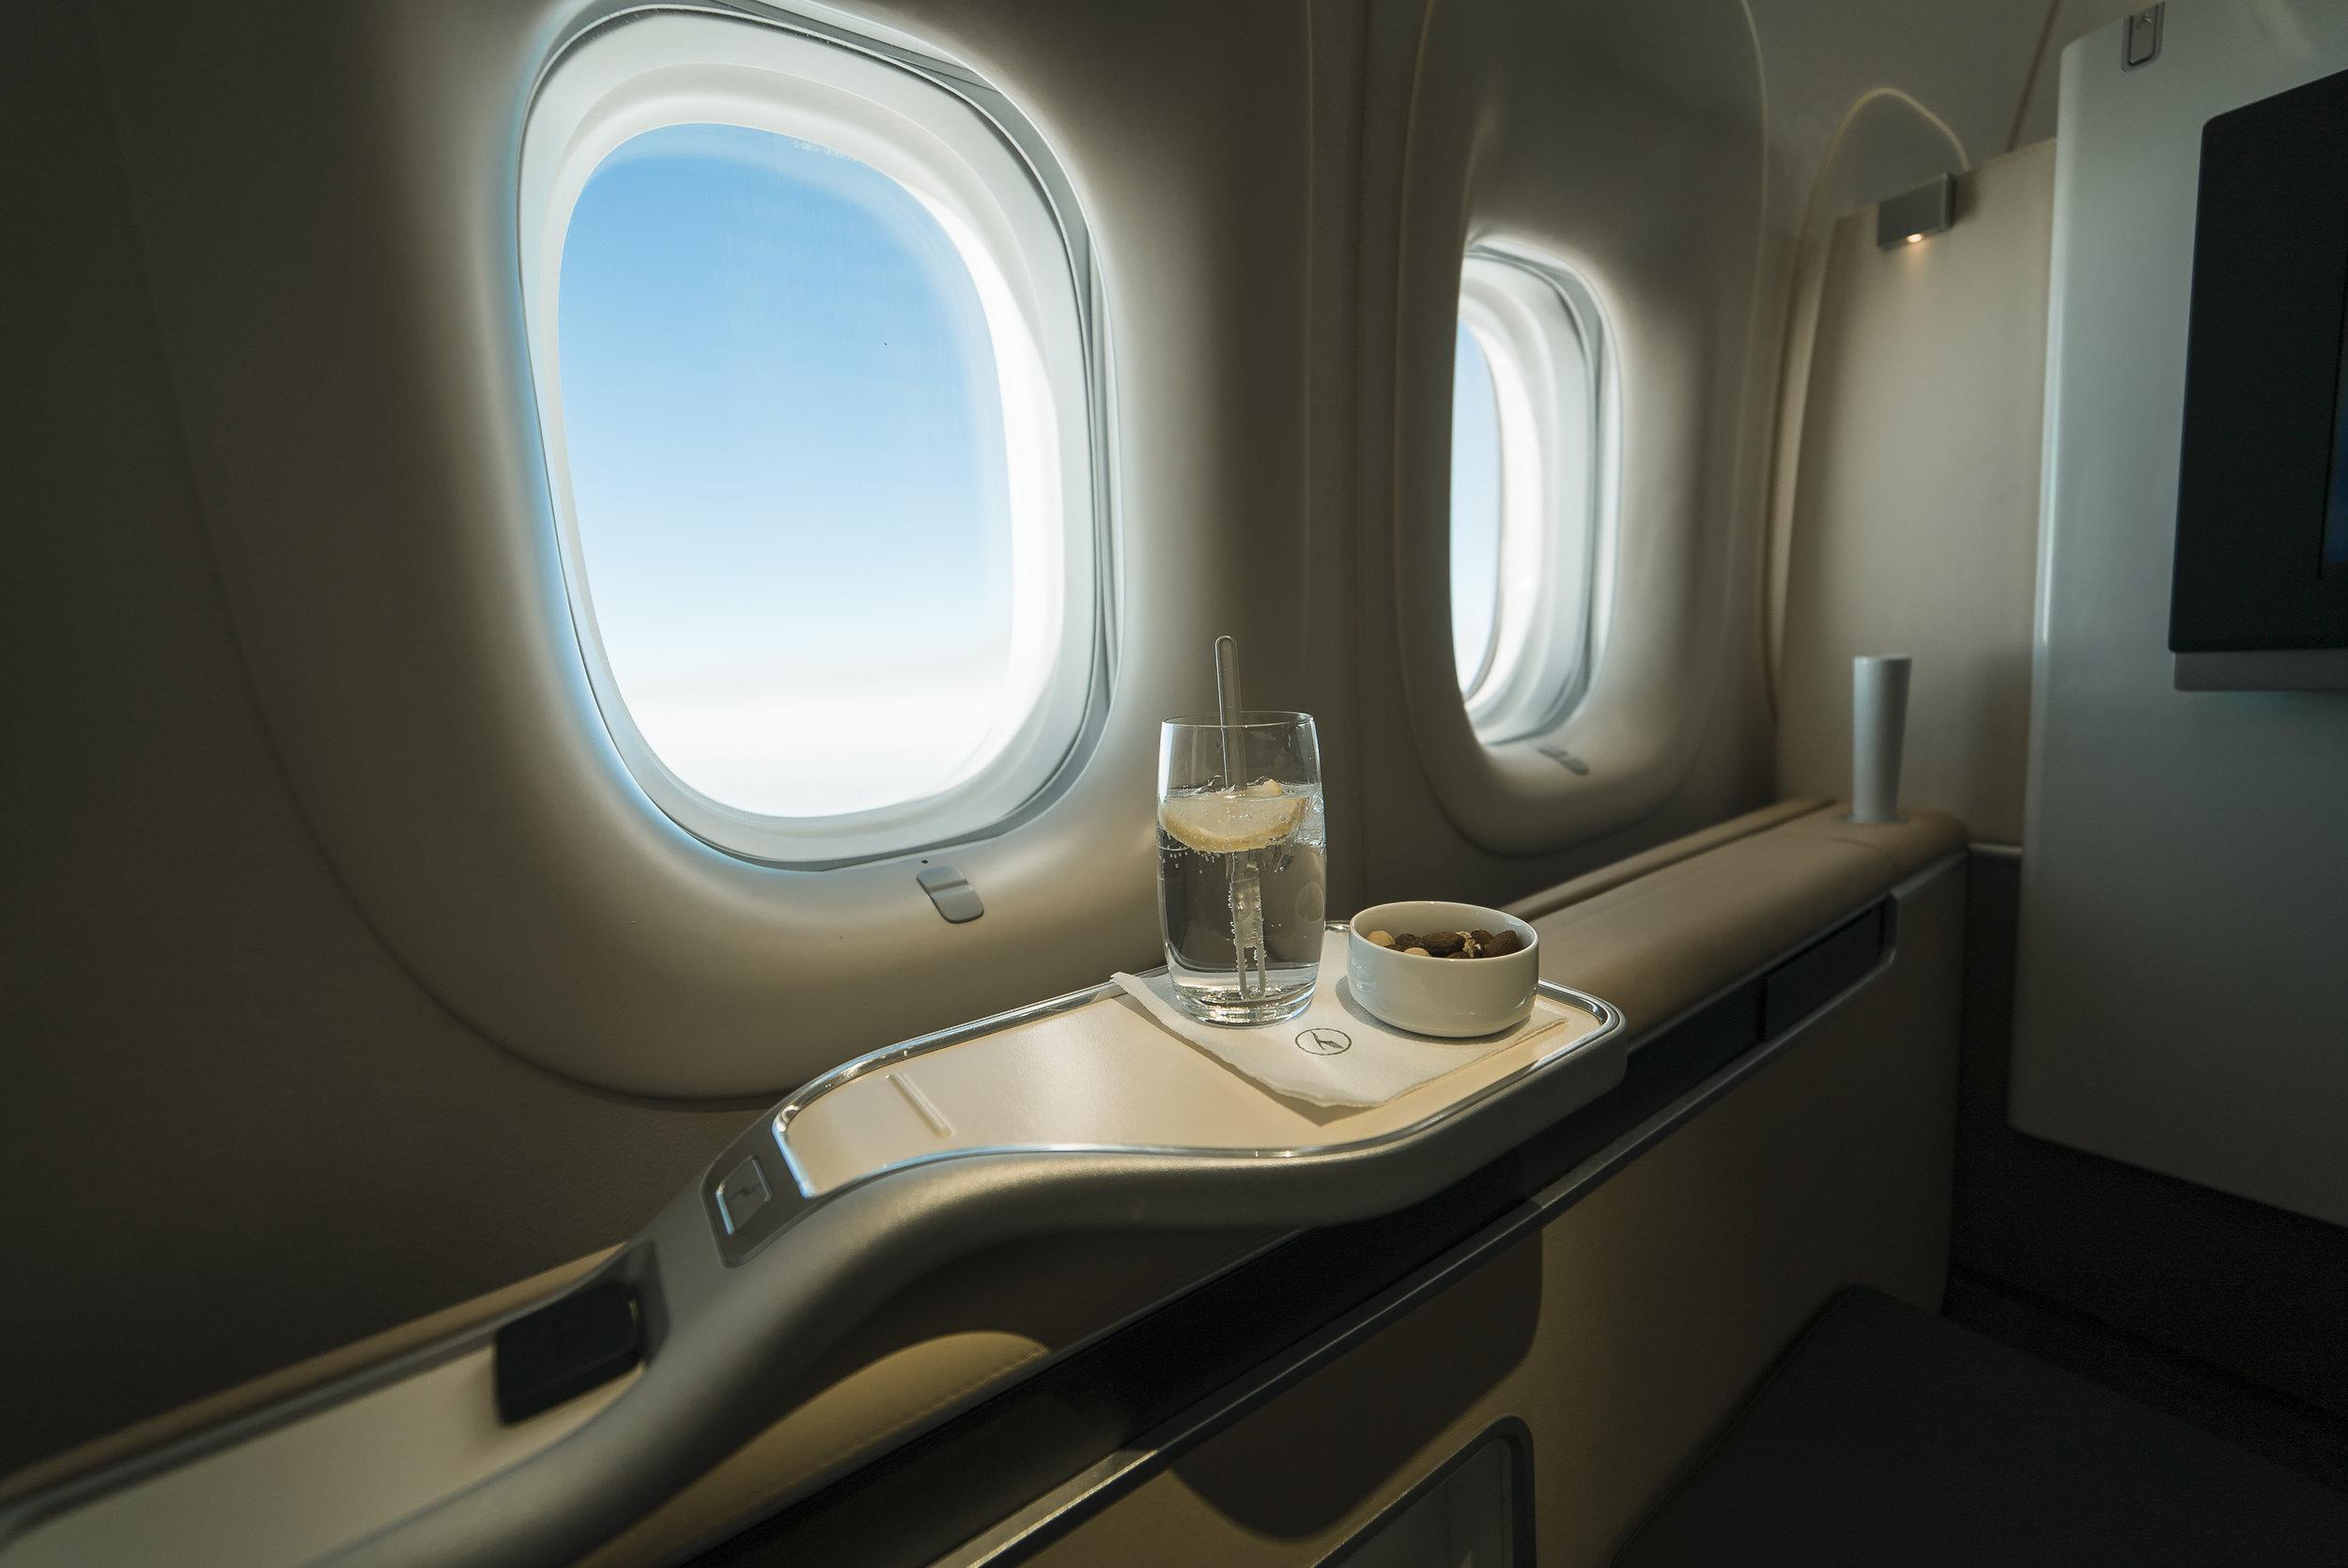 Lufthansa-08276.jpg